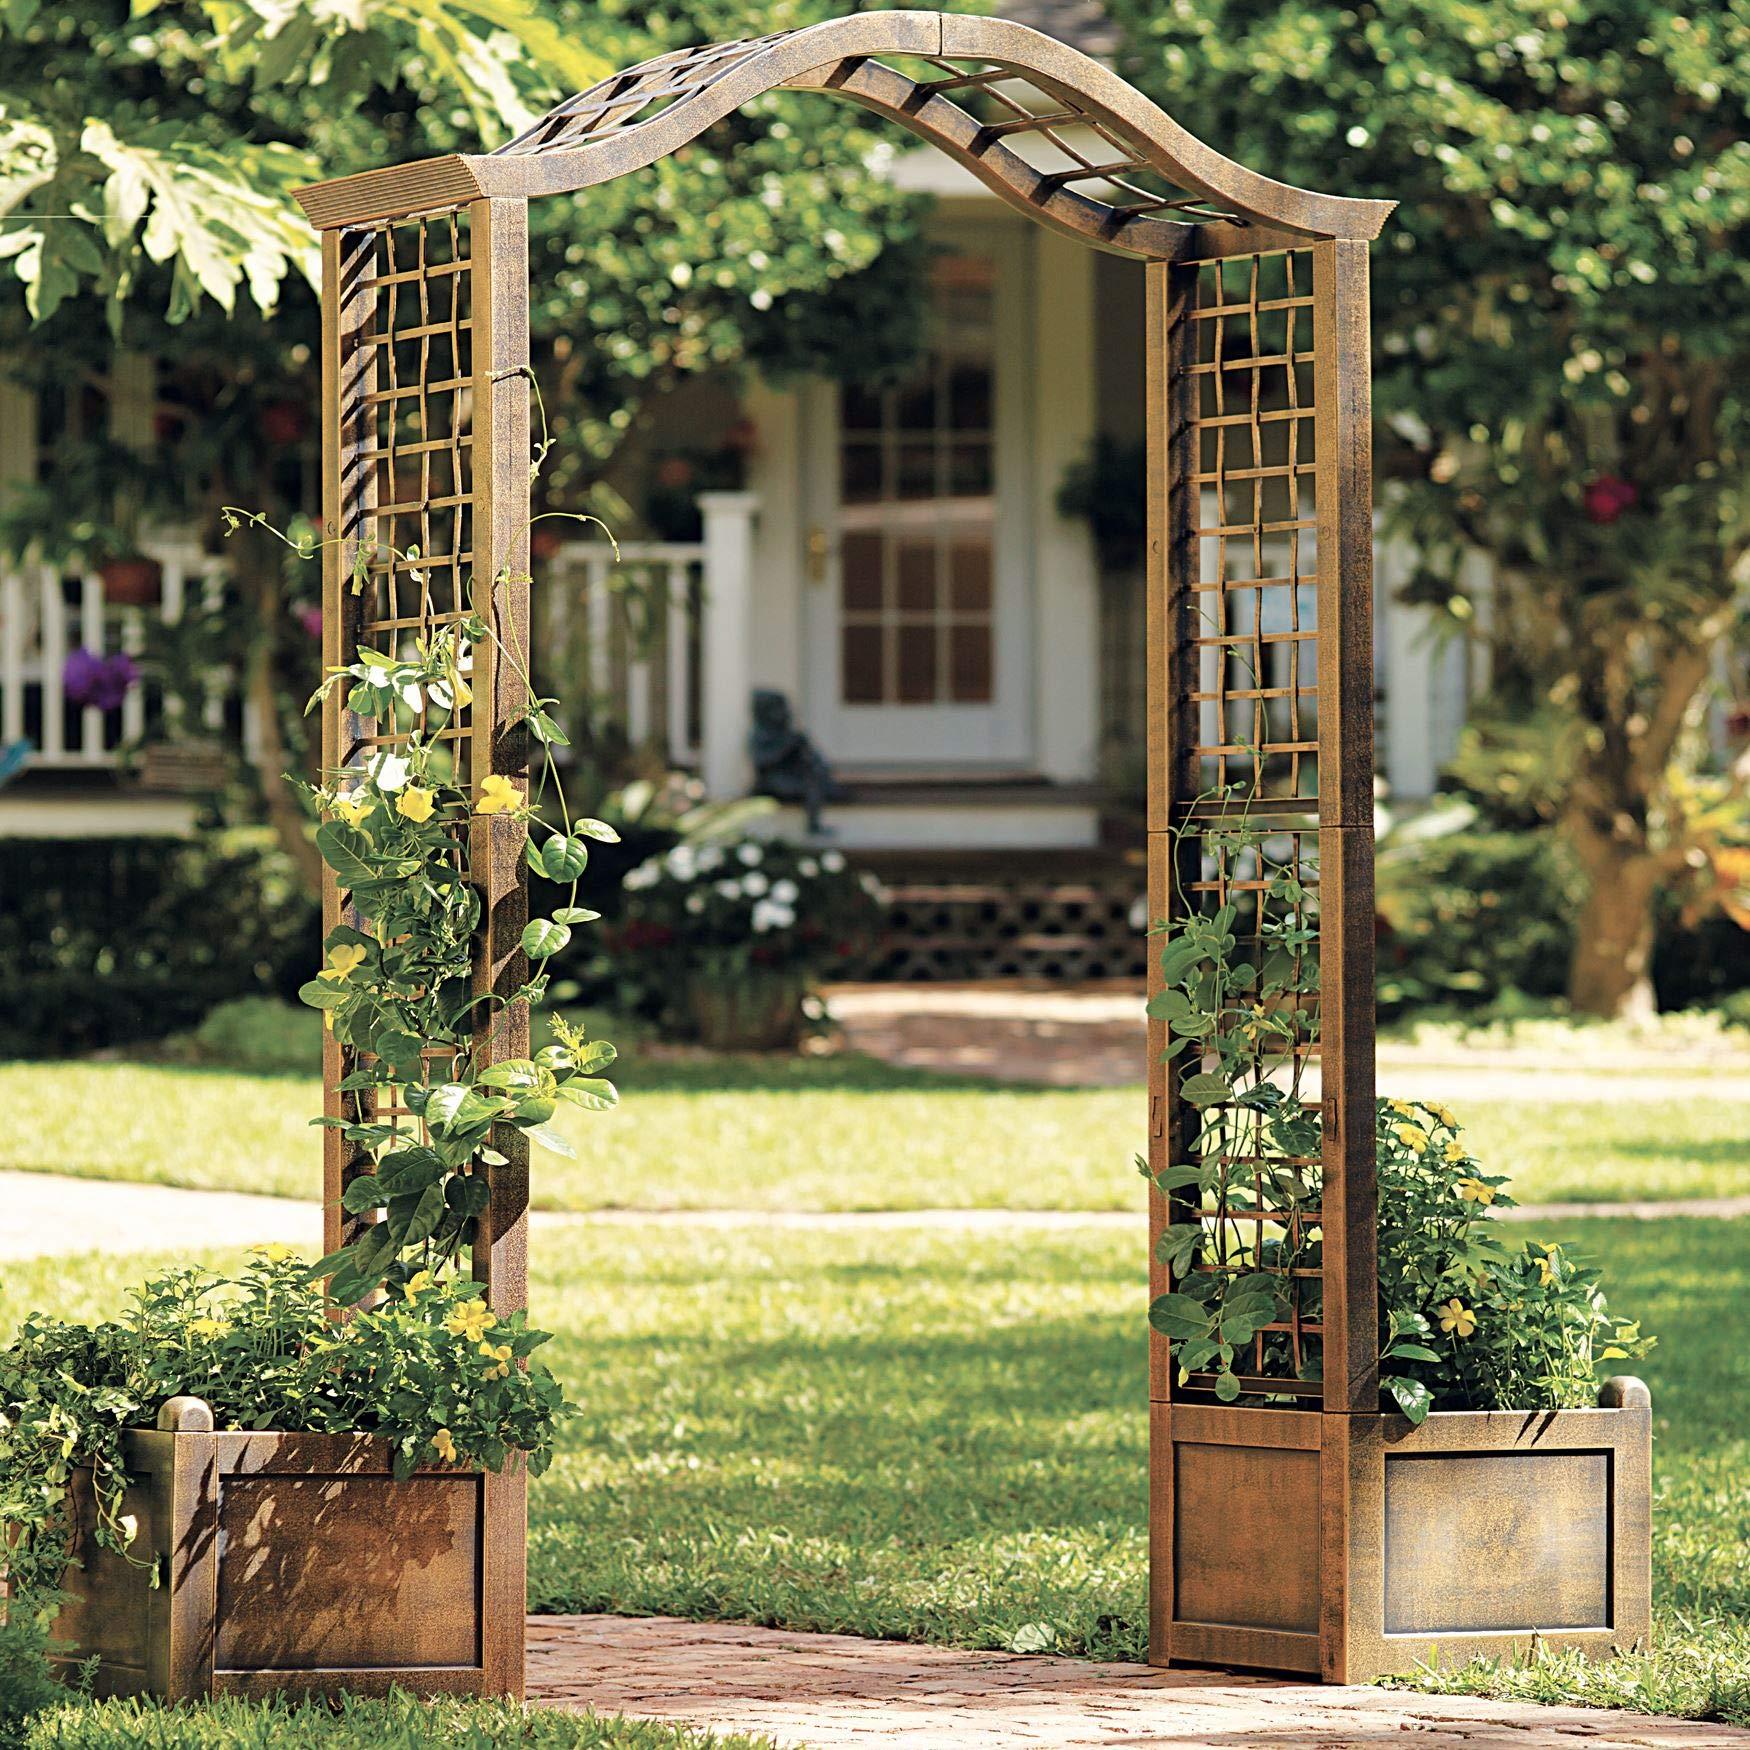 BrylaneHome Resin Garden Arch Trellis - Bronze